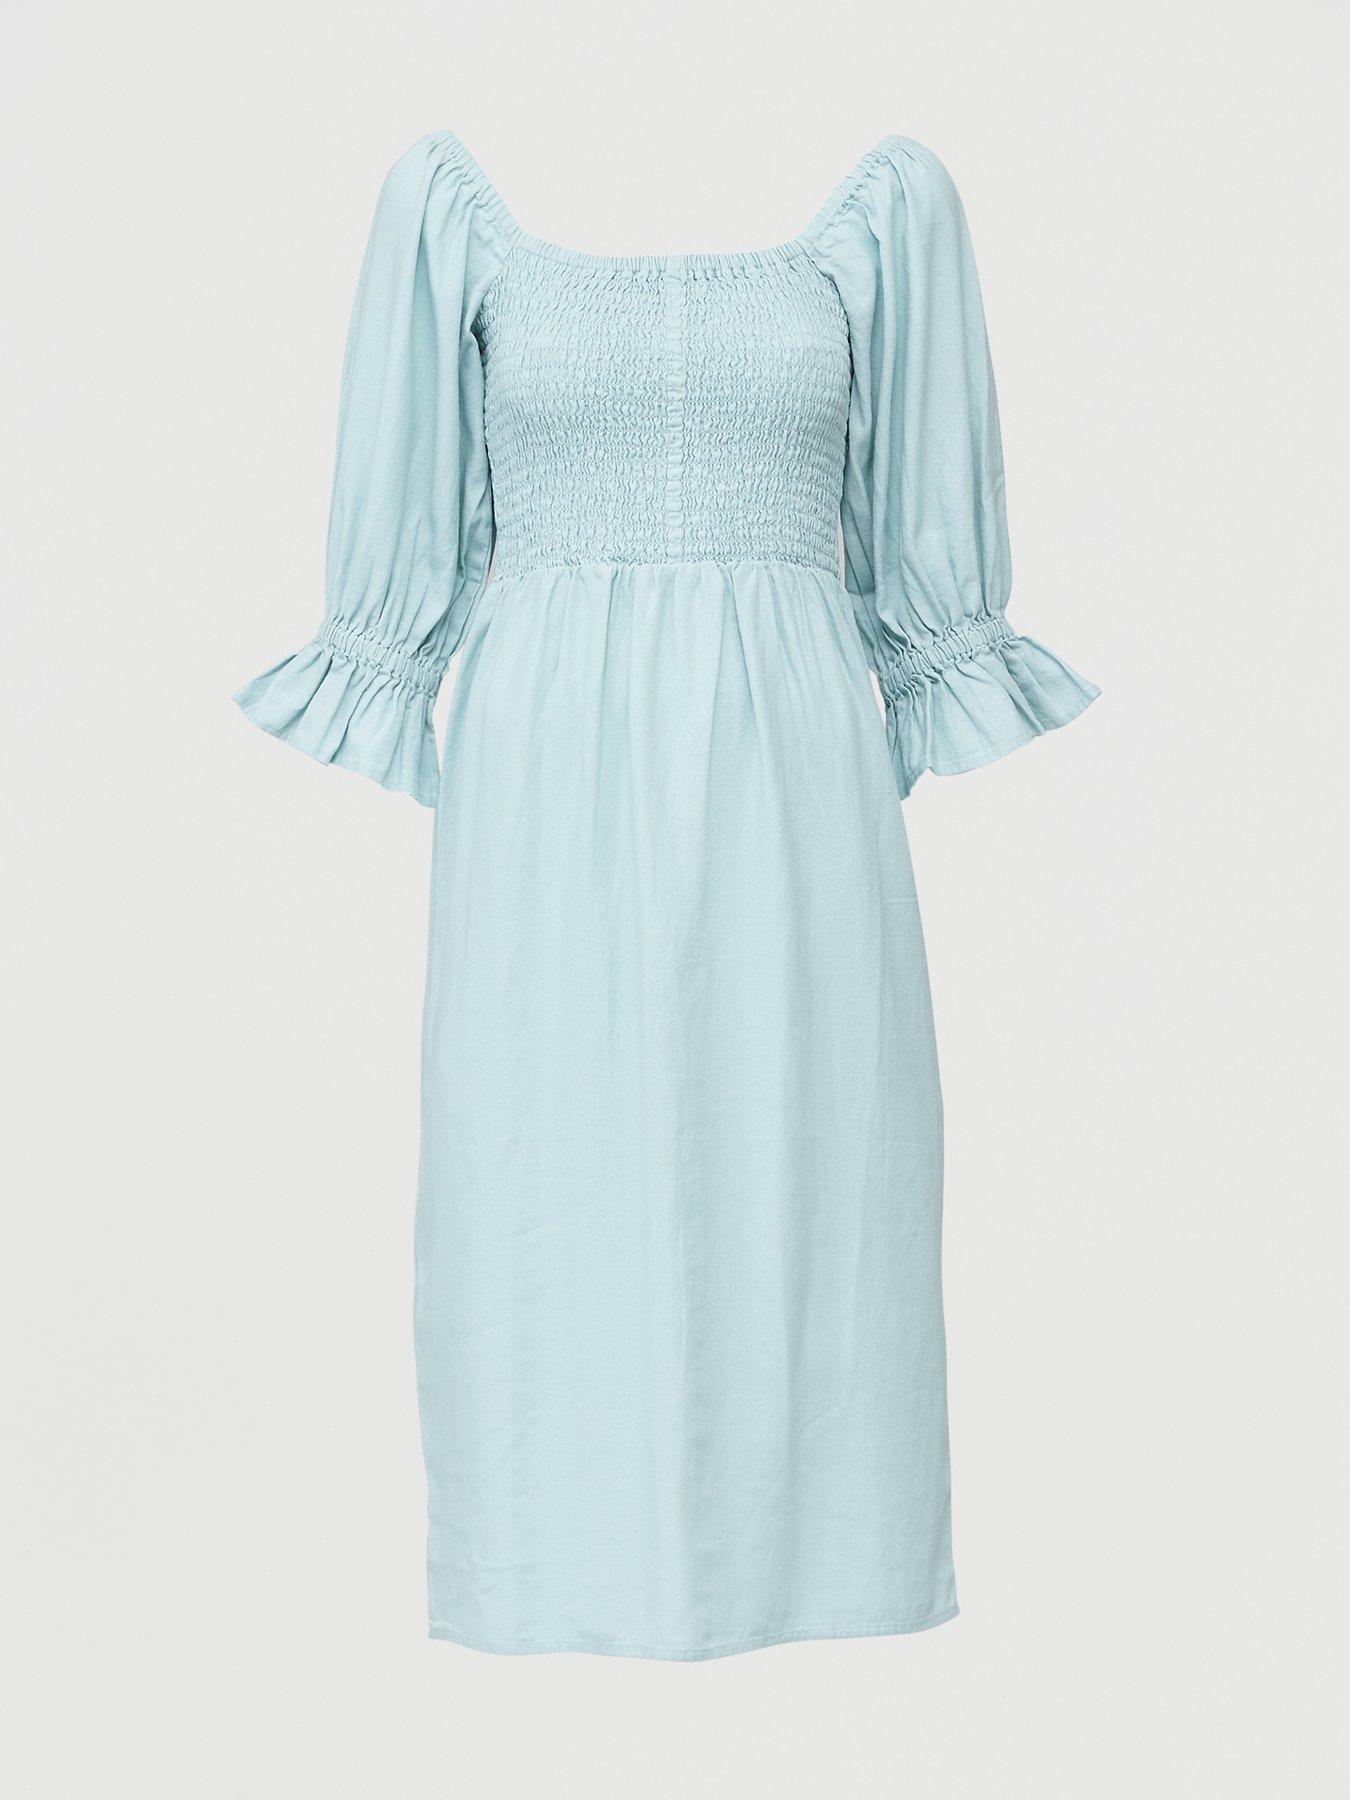 Womens Ladies Casual Sleeveless Striped Beach Swing Midi Dress Size 10 12 14 16